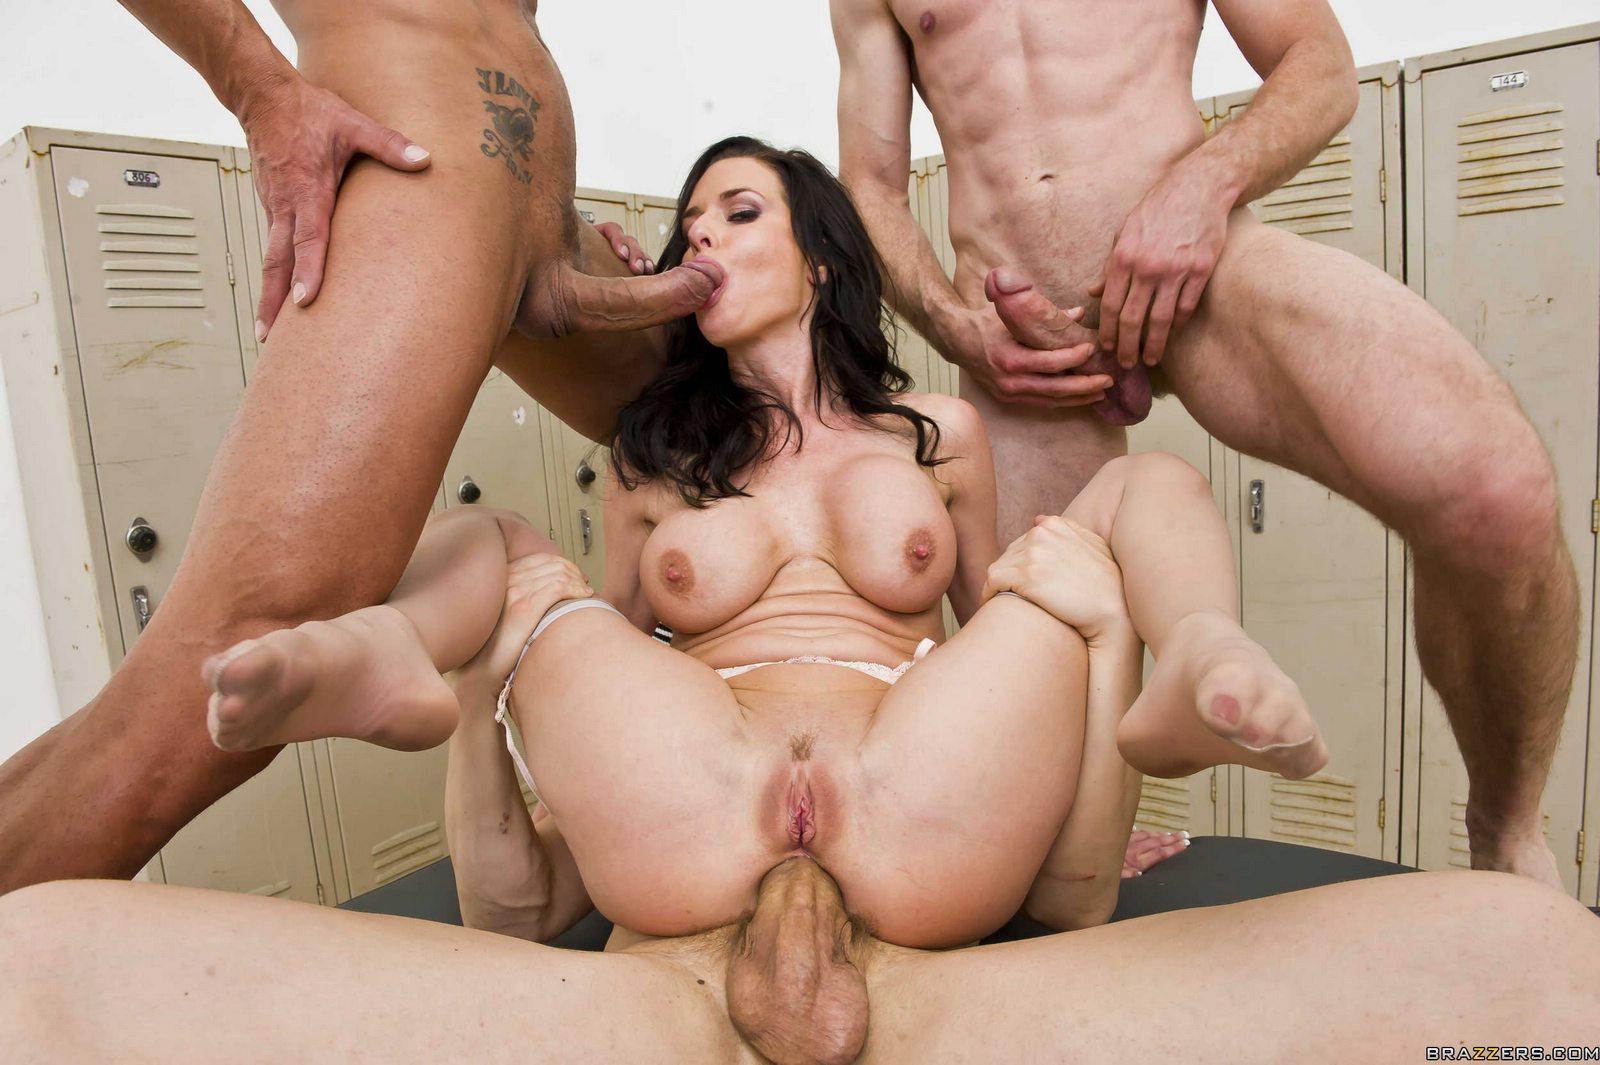 Busty milf pornstar veronica avluv taking hardcore anal sex outdoors